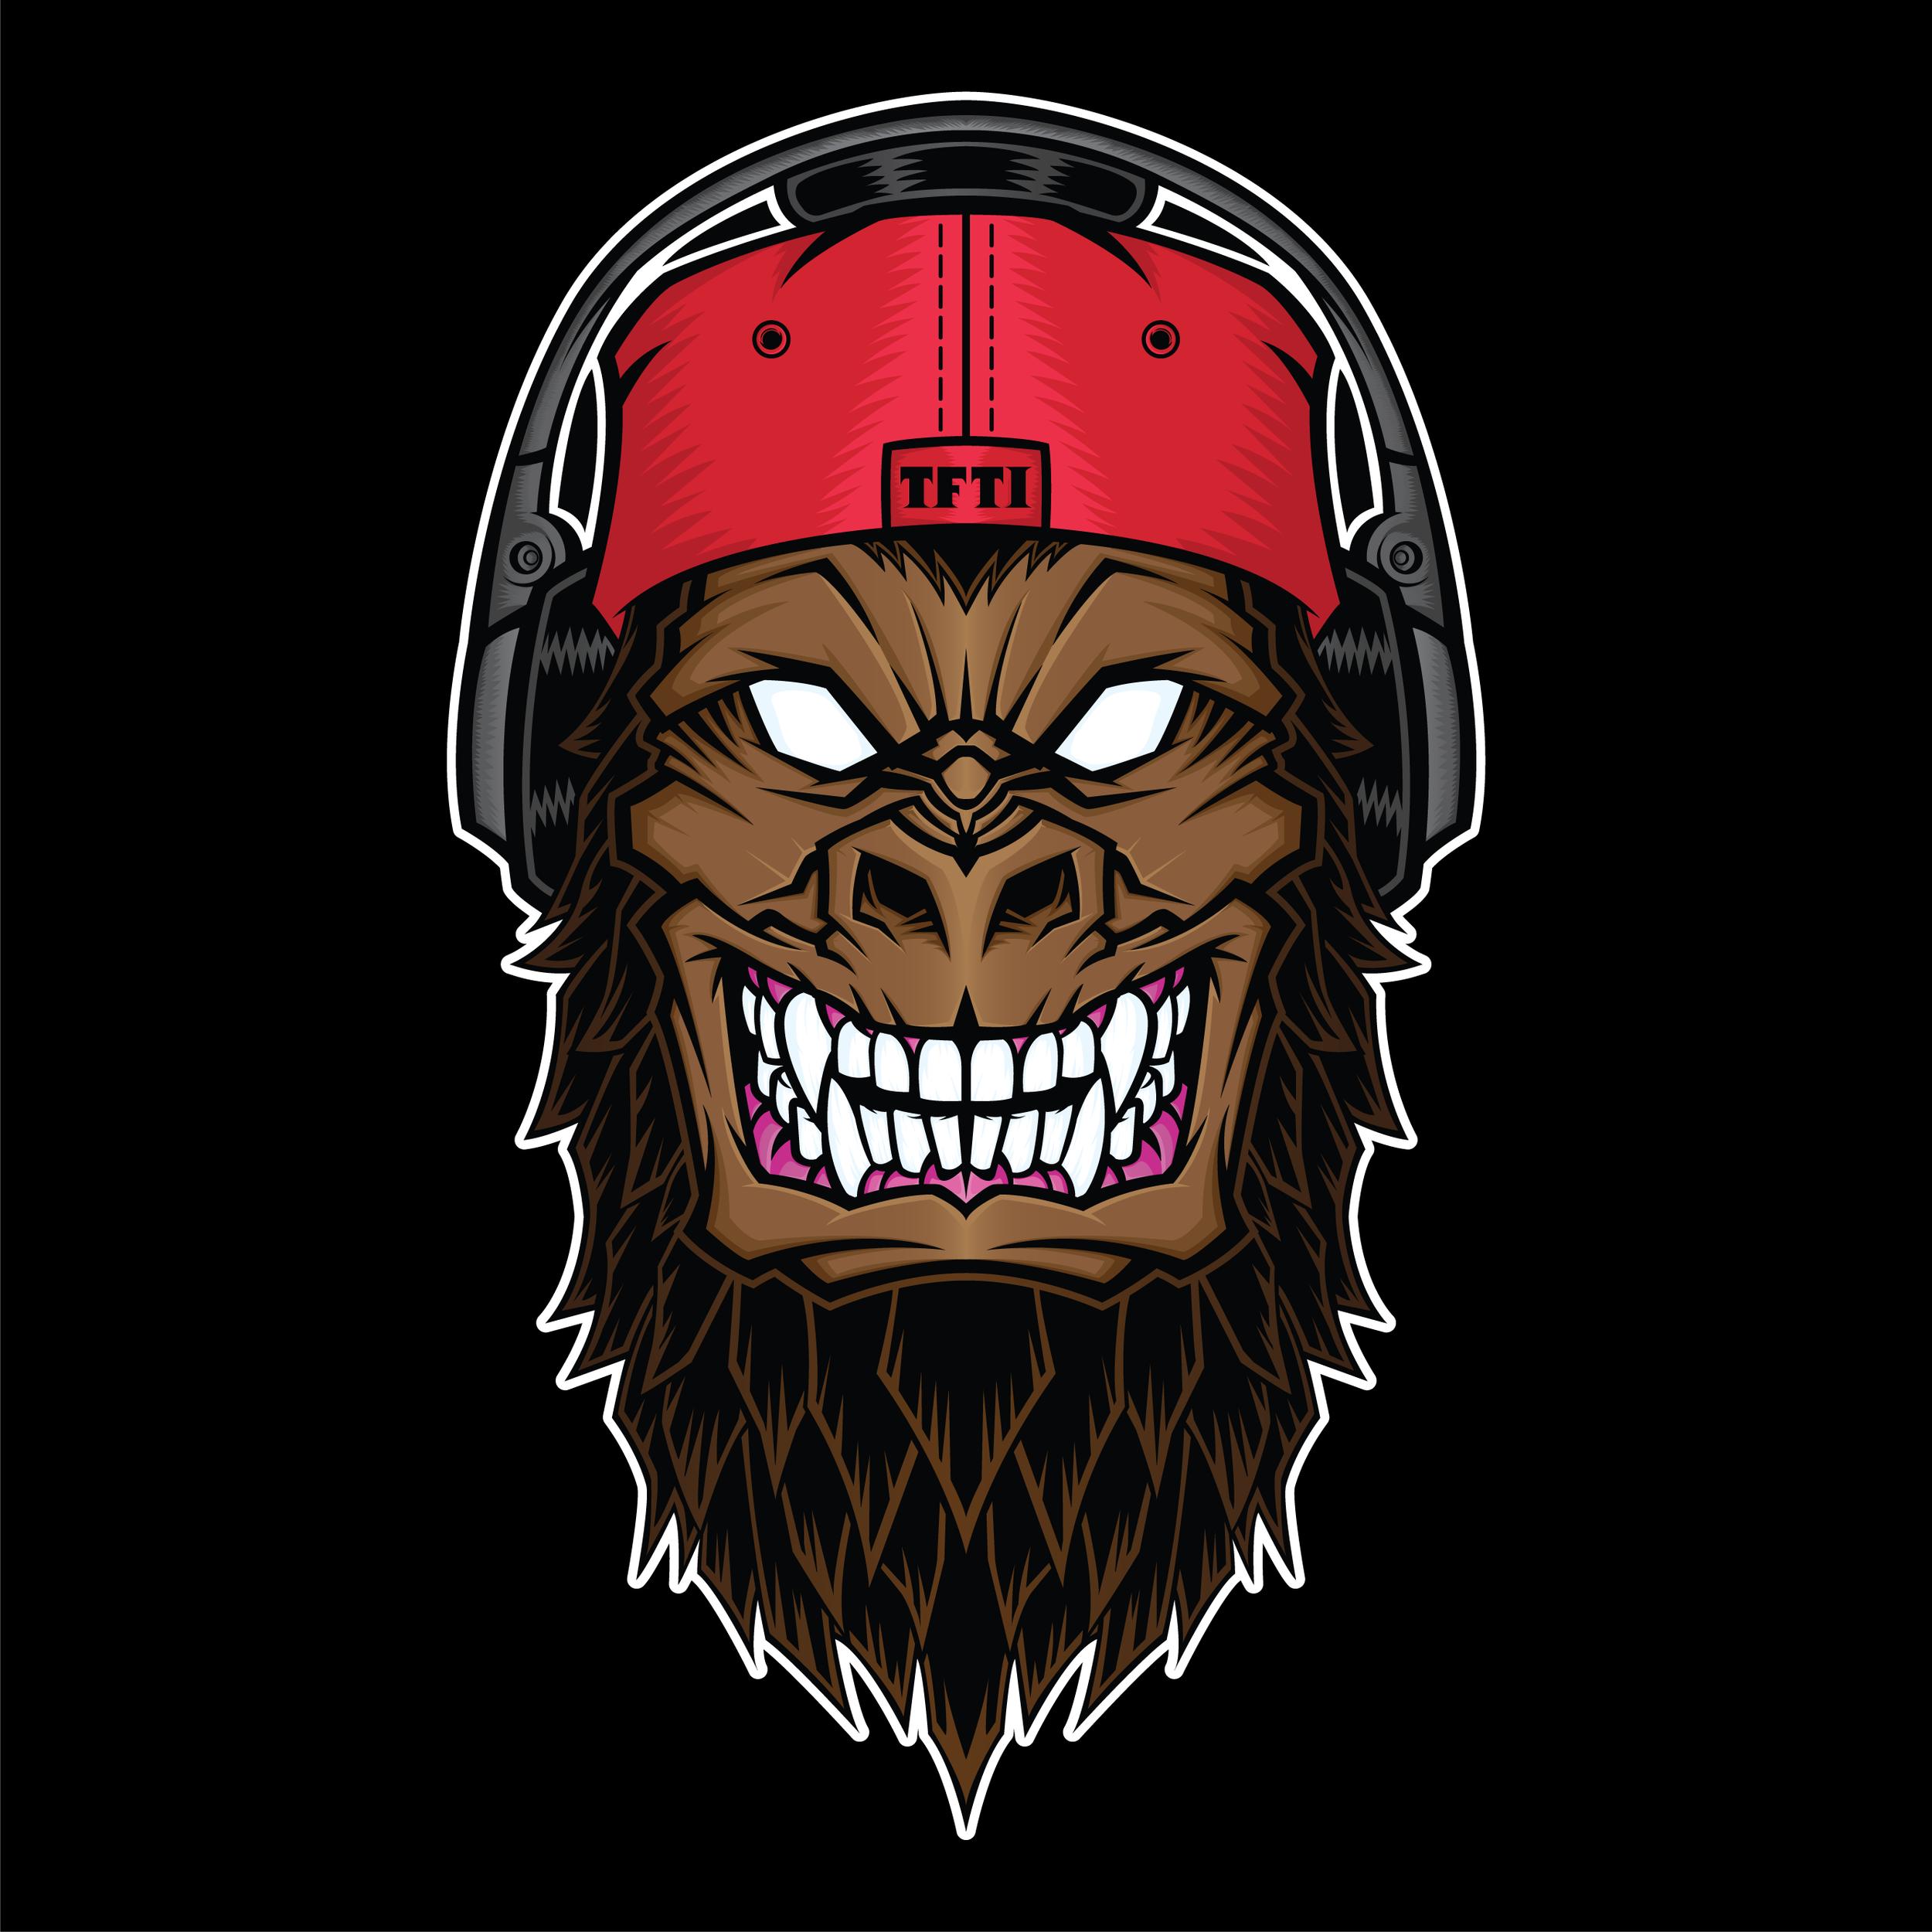 tfti-vector-logo-podcast-ape.jpg